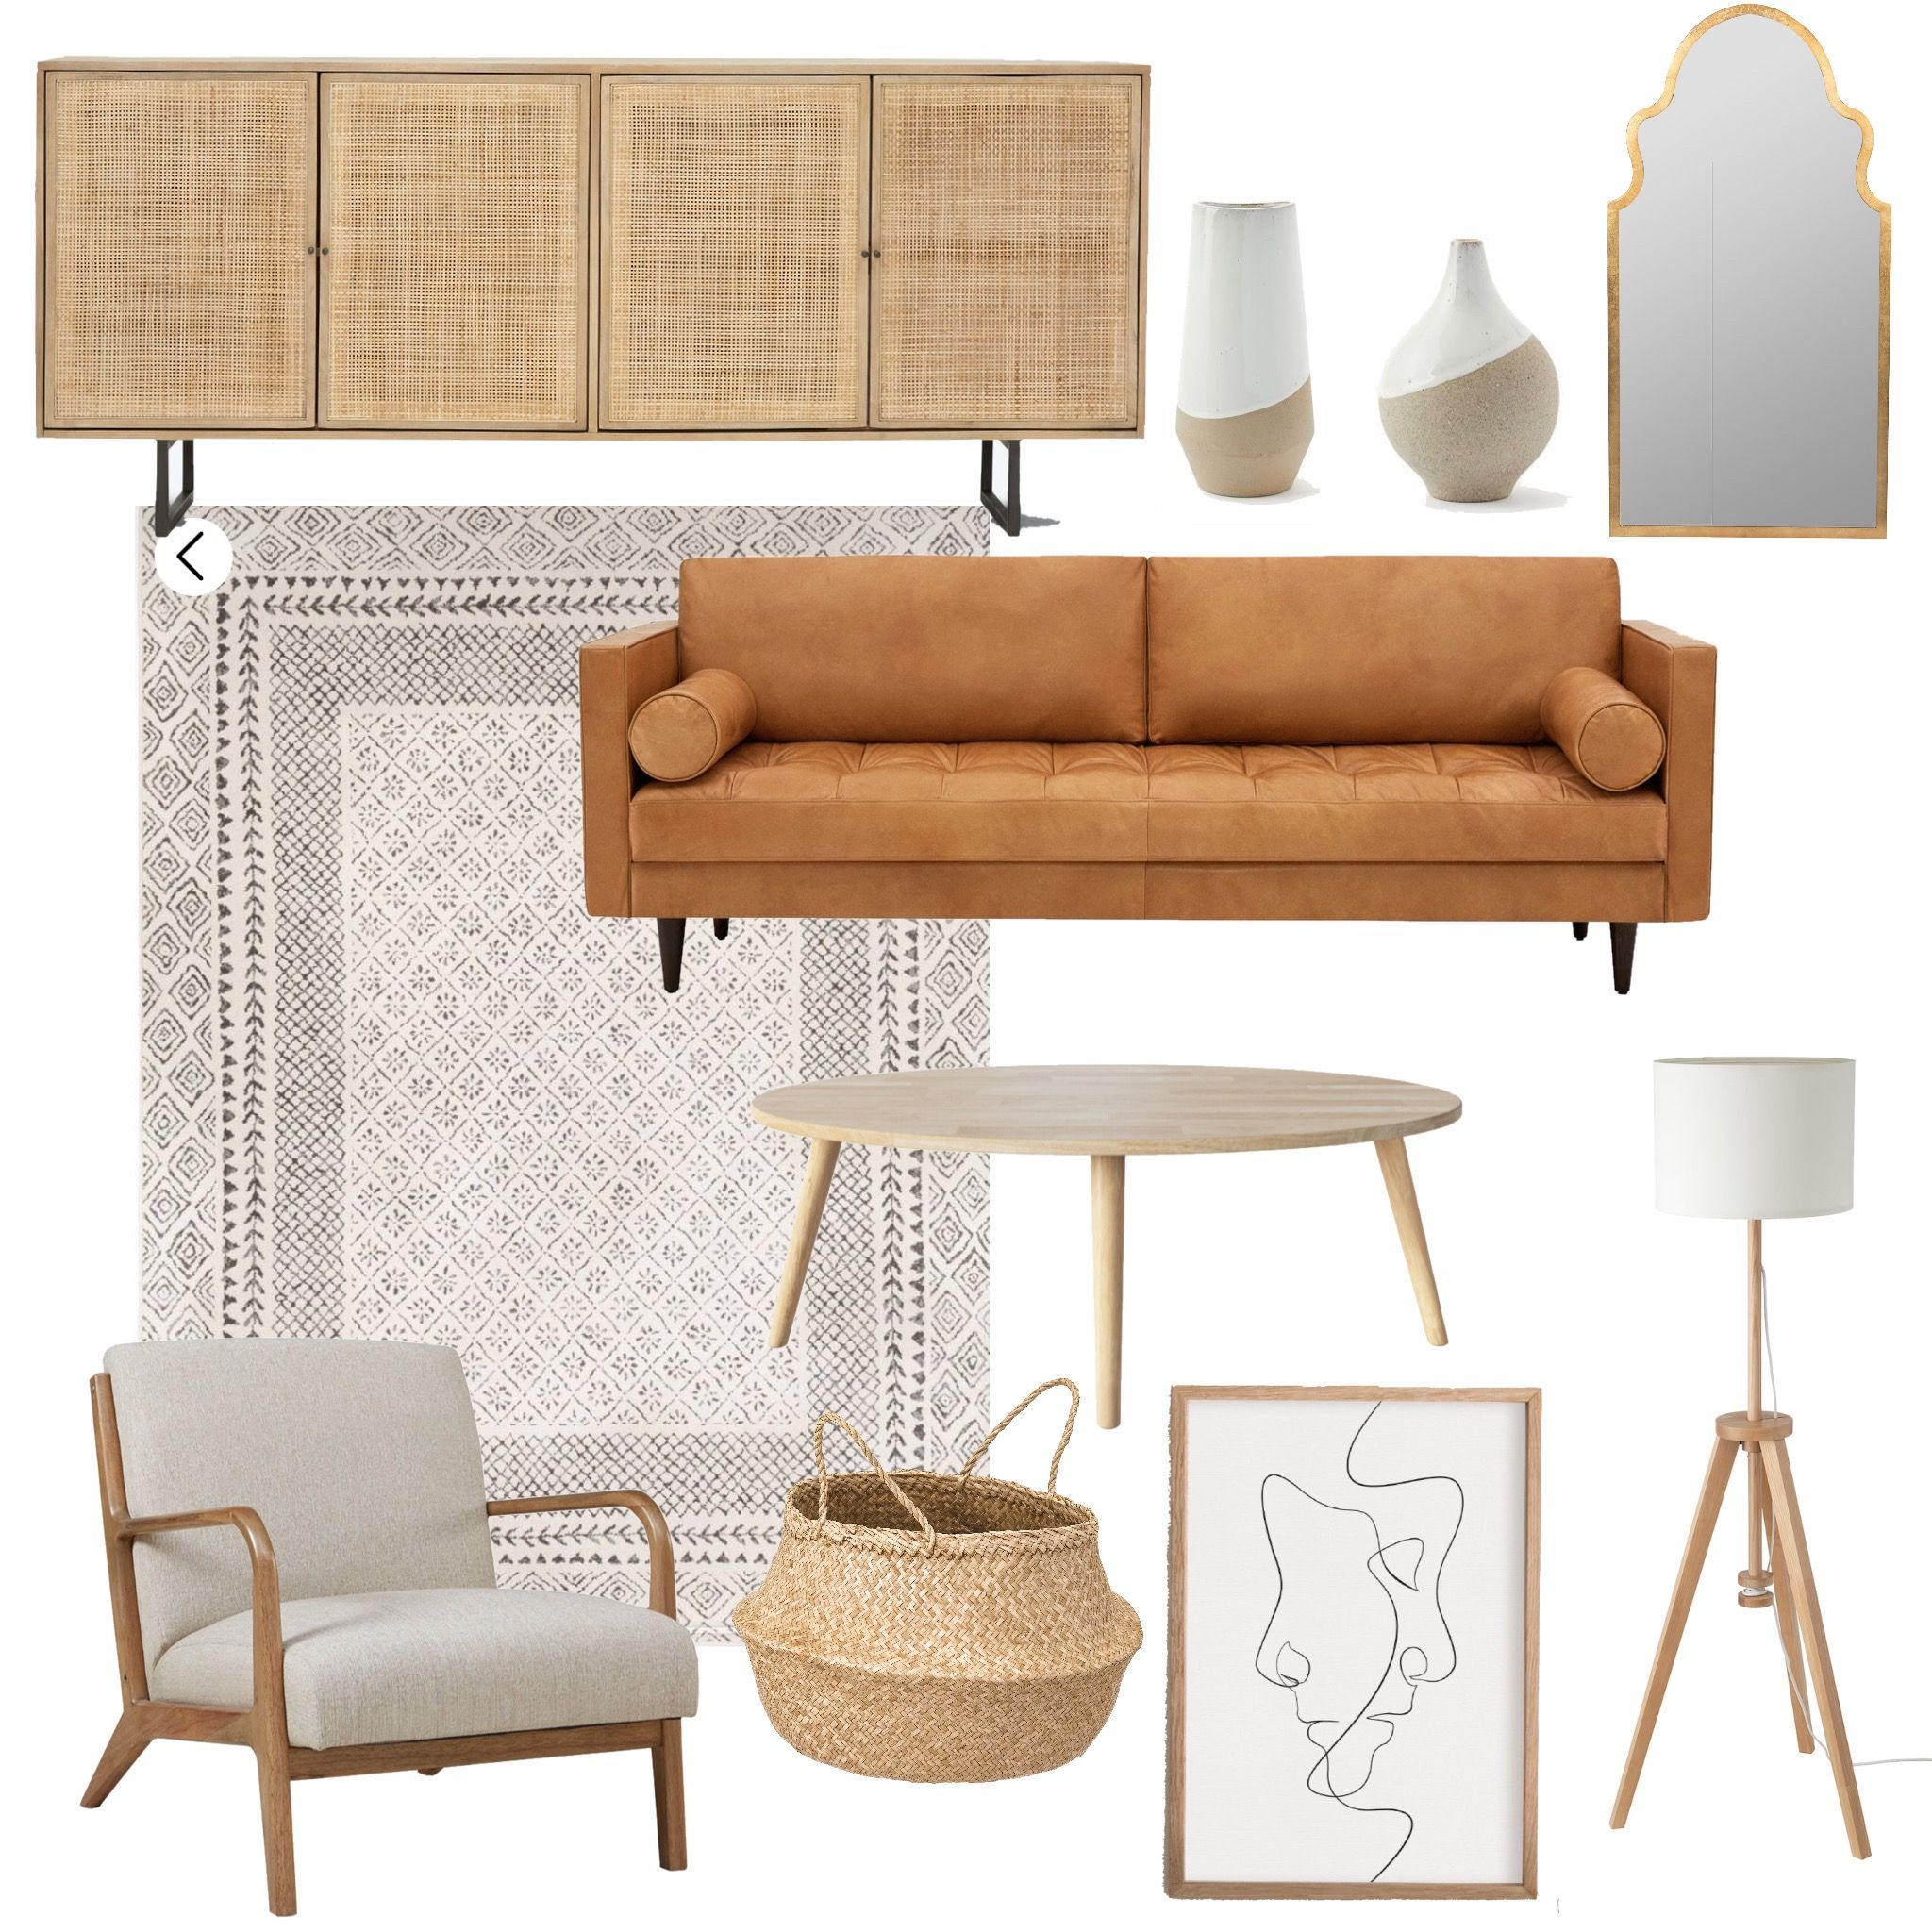 LIKEtoKNOW.it Neutral Modern Living Room